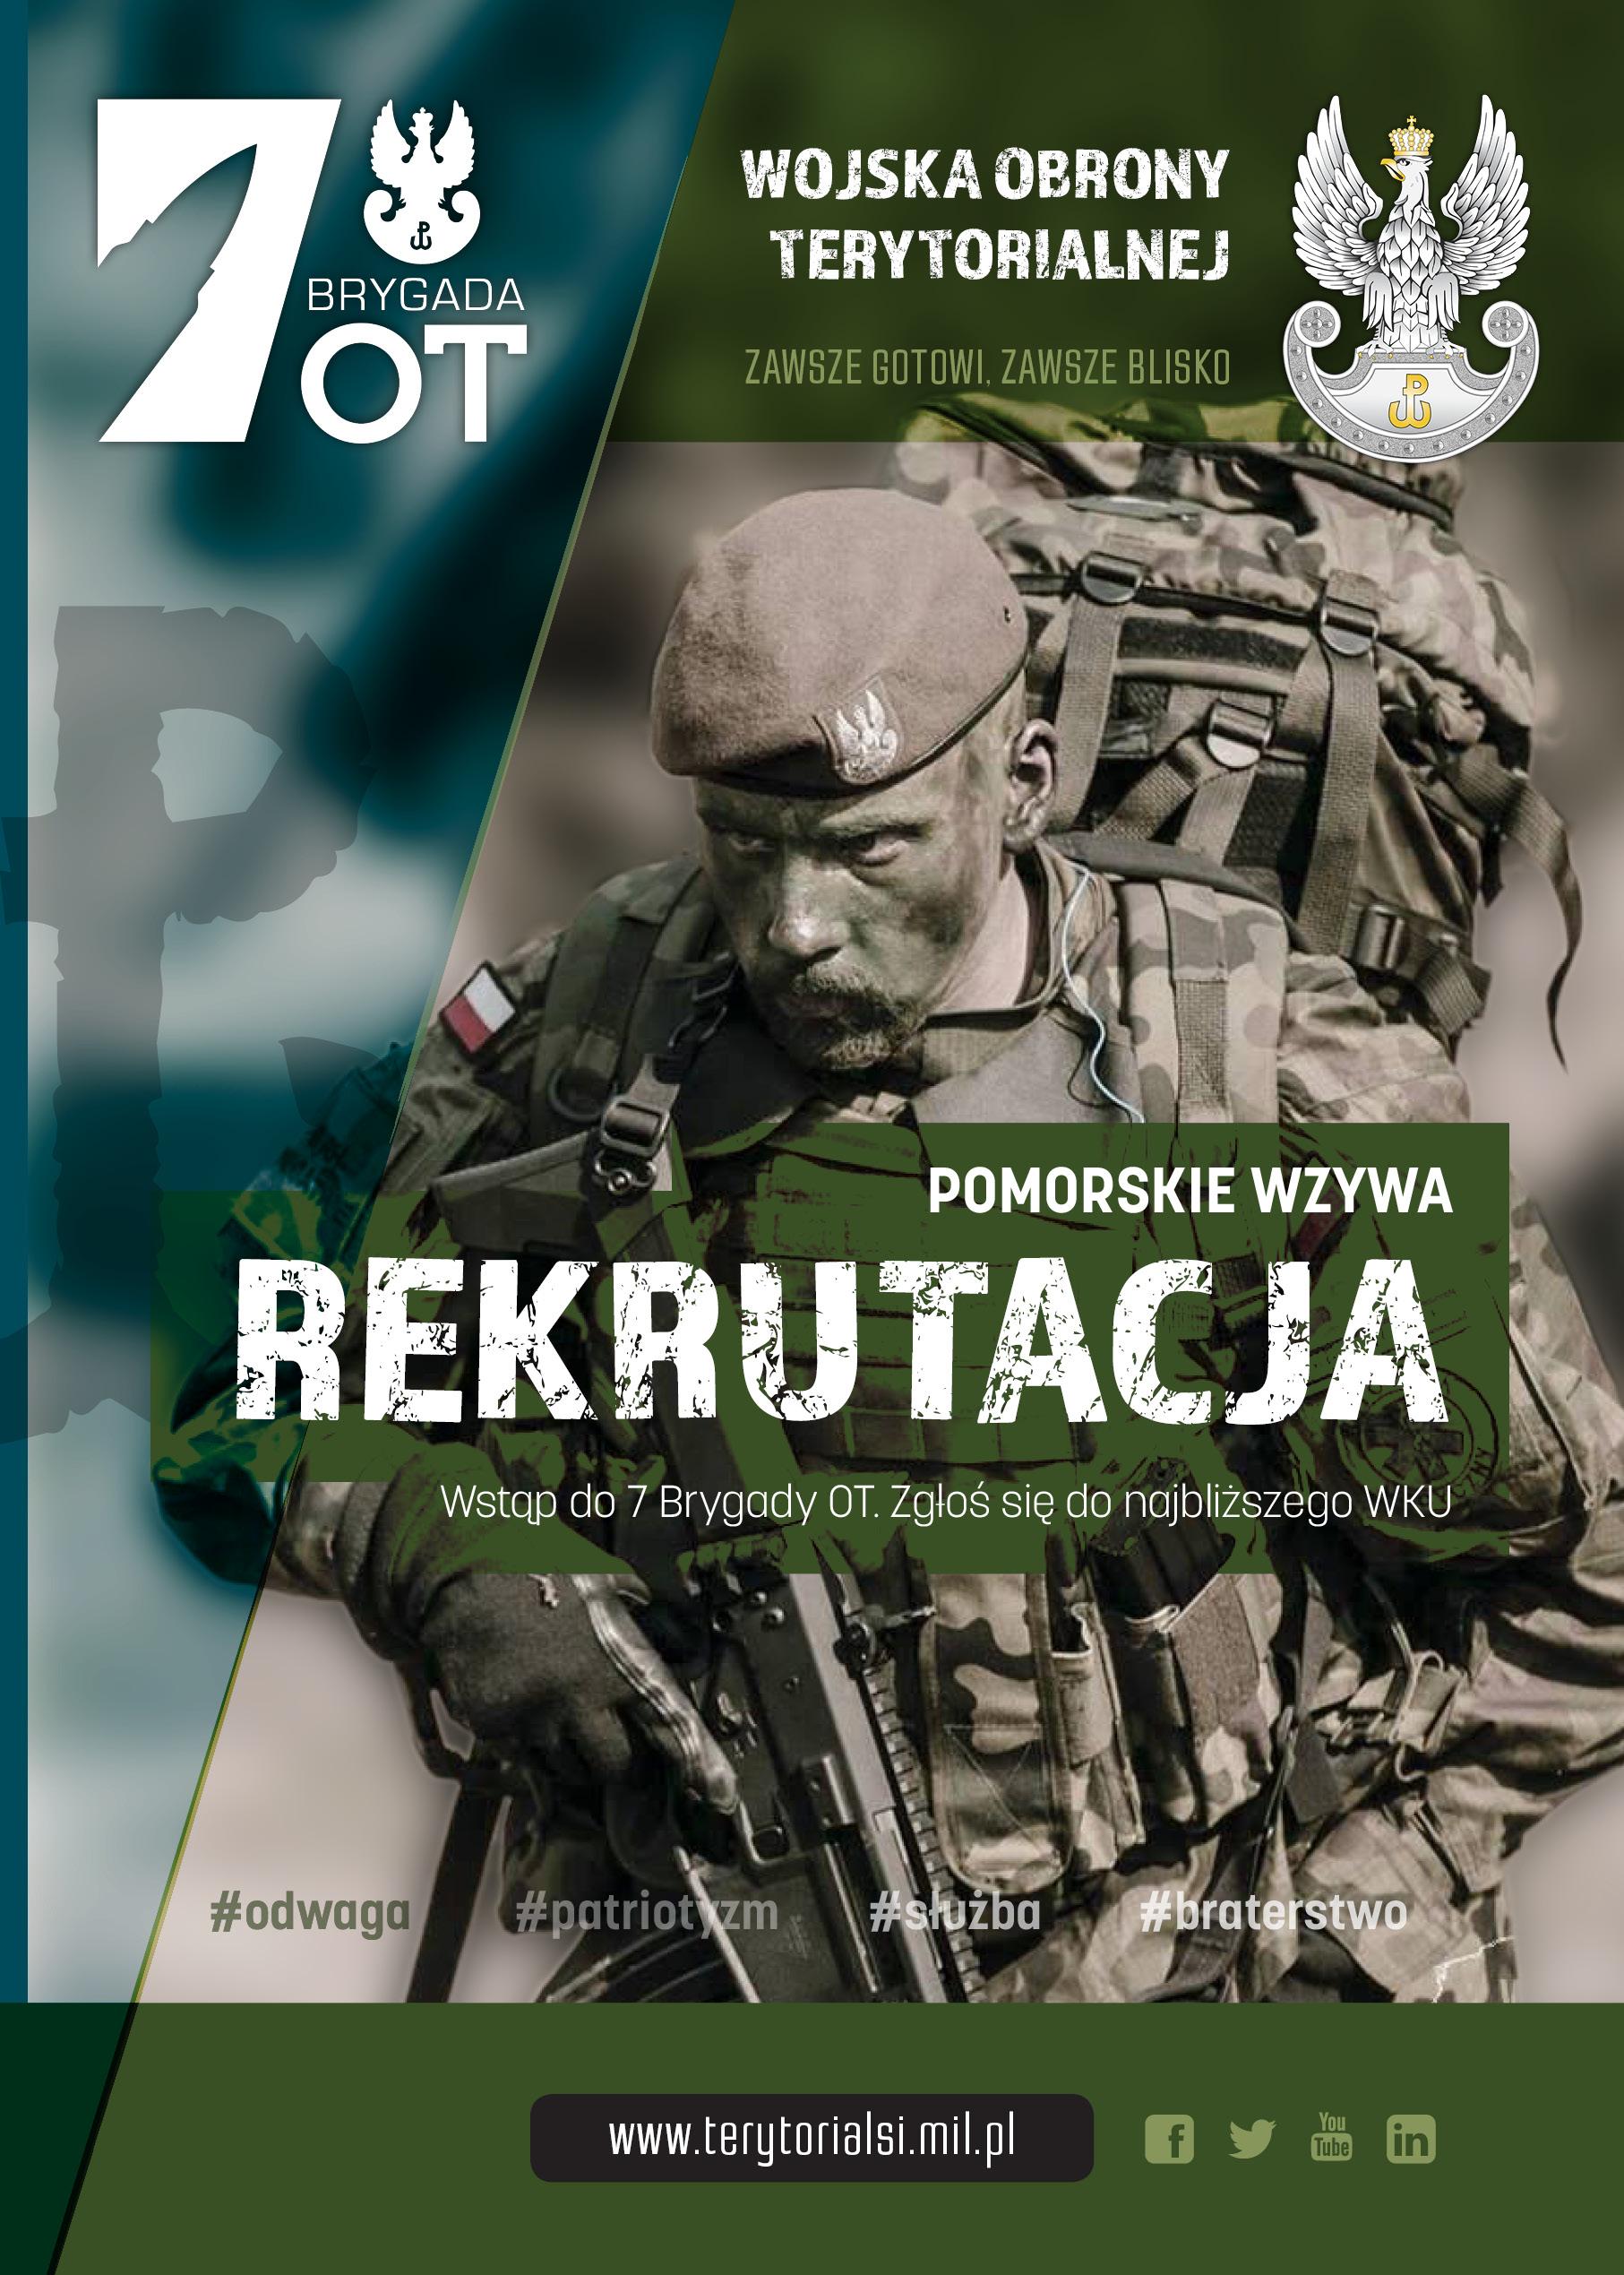 http://m.82-200.pl/2018/06/orig/7bot-plakat-rekrutacja-a3-3148.jpg